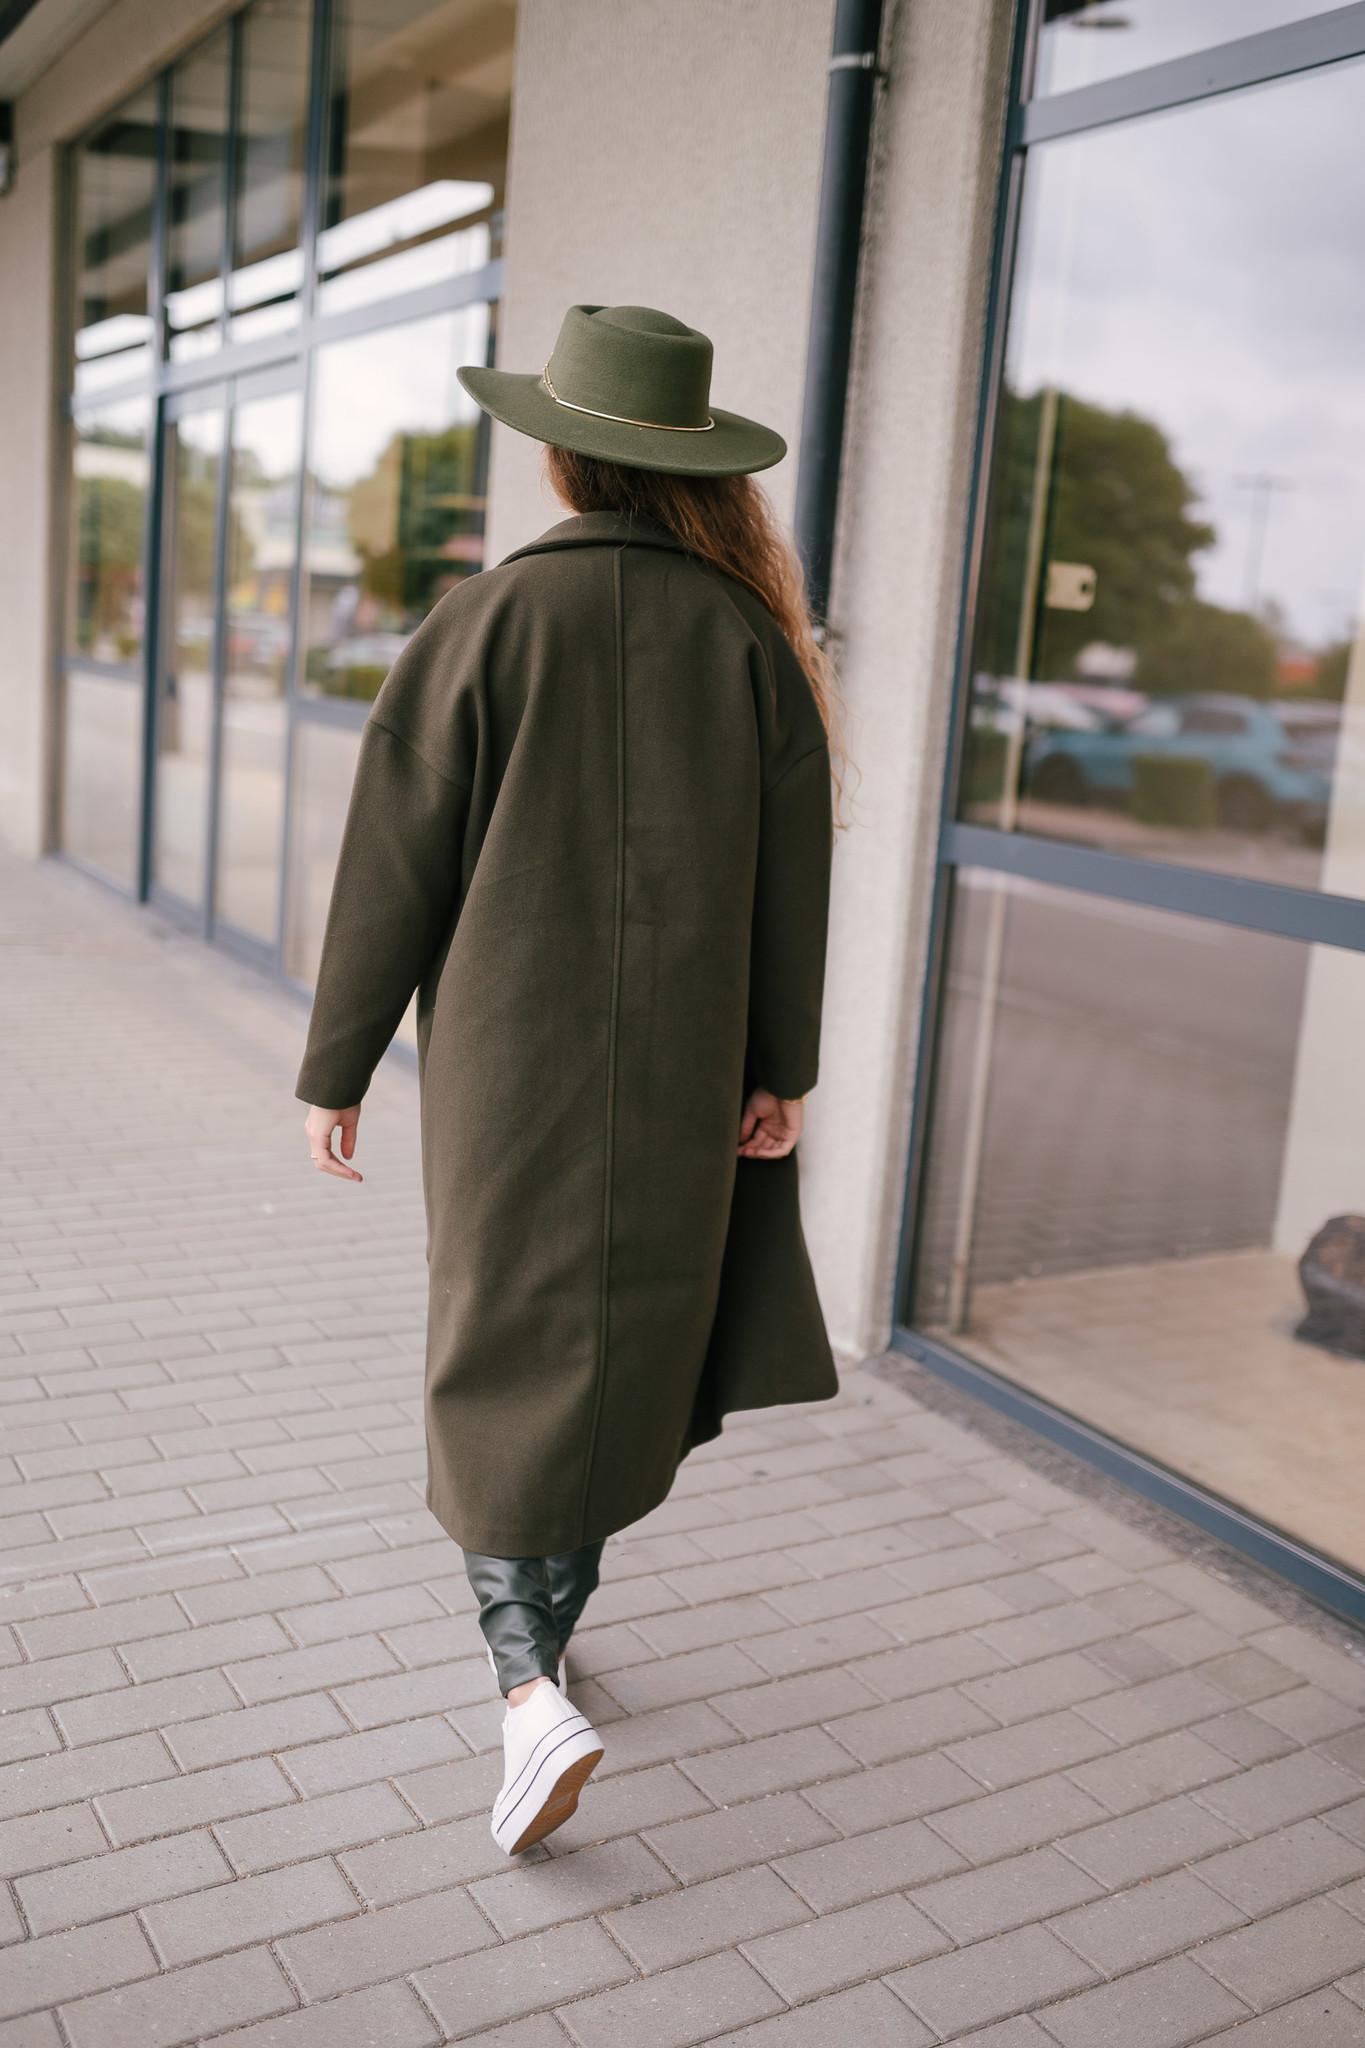 TOSCAN chapeau kaki-2